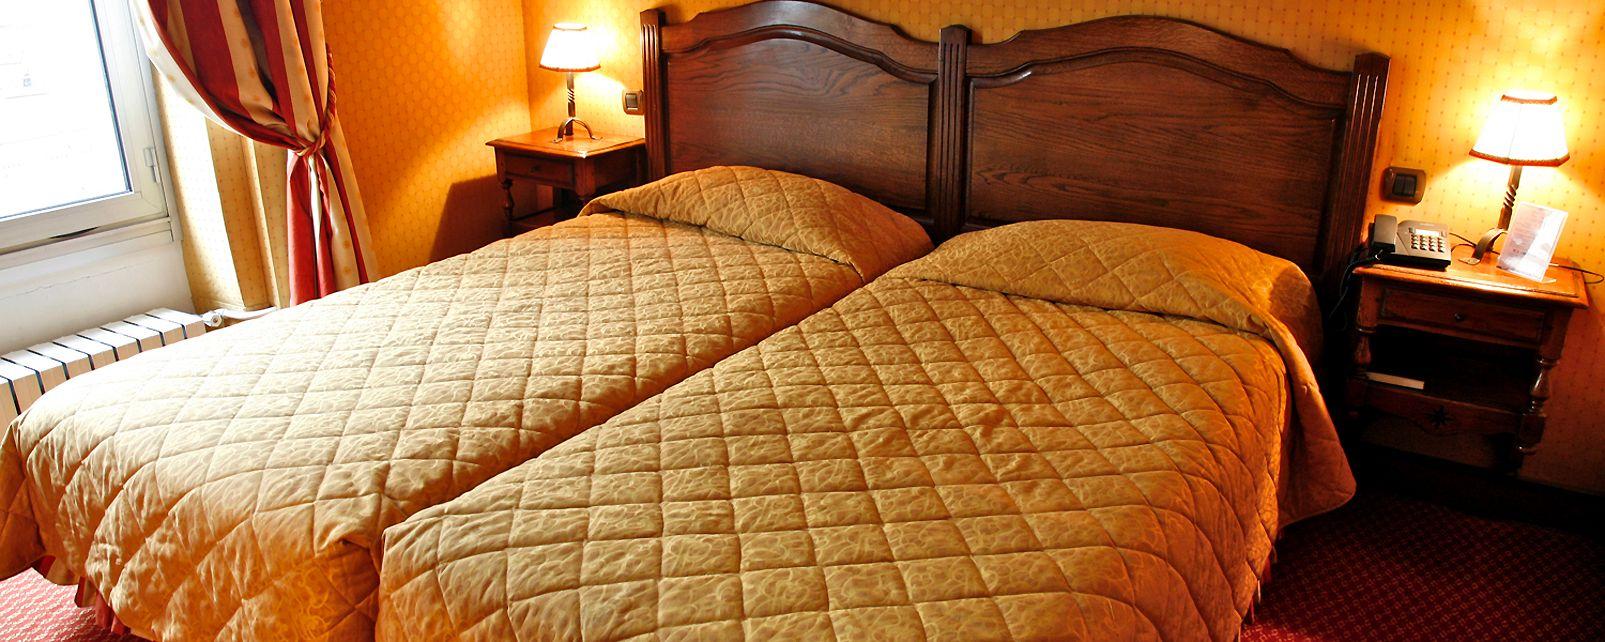 Hotel Amarante Beau Manoir